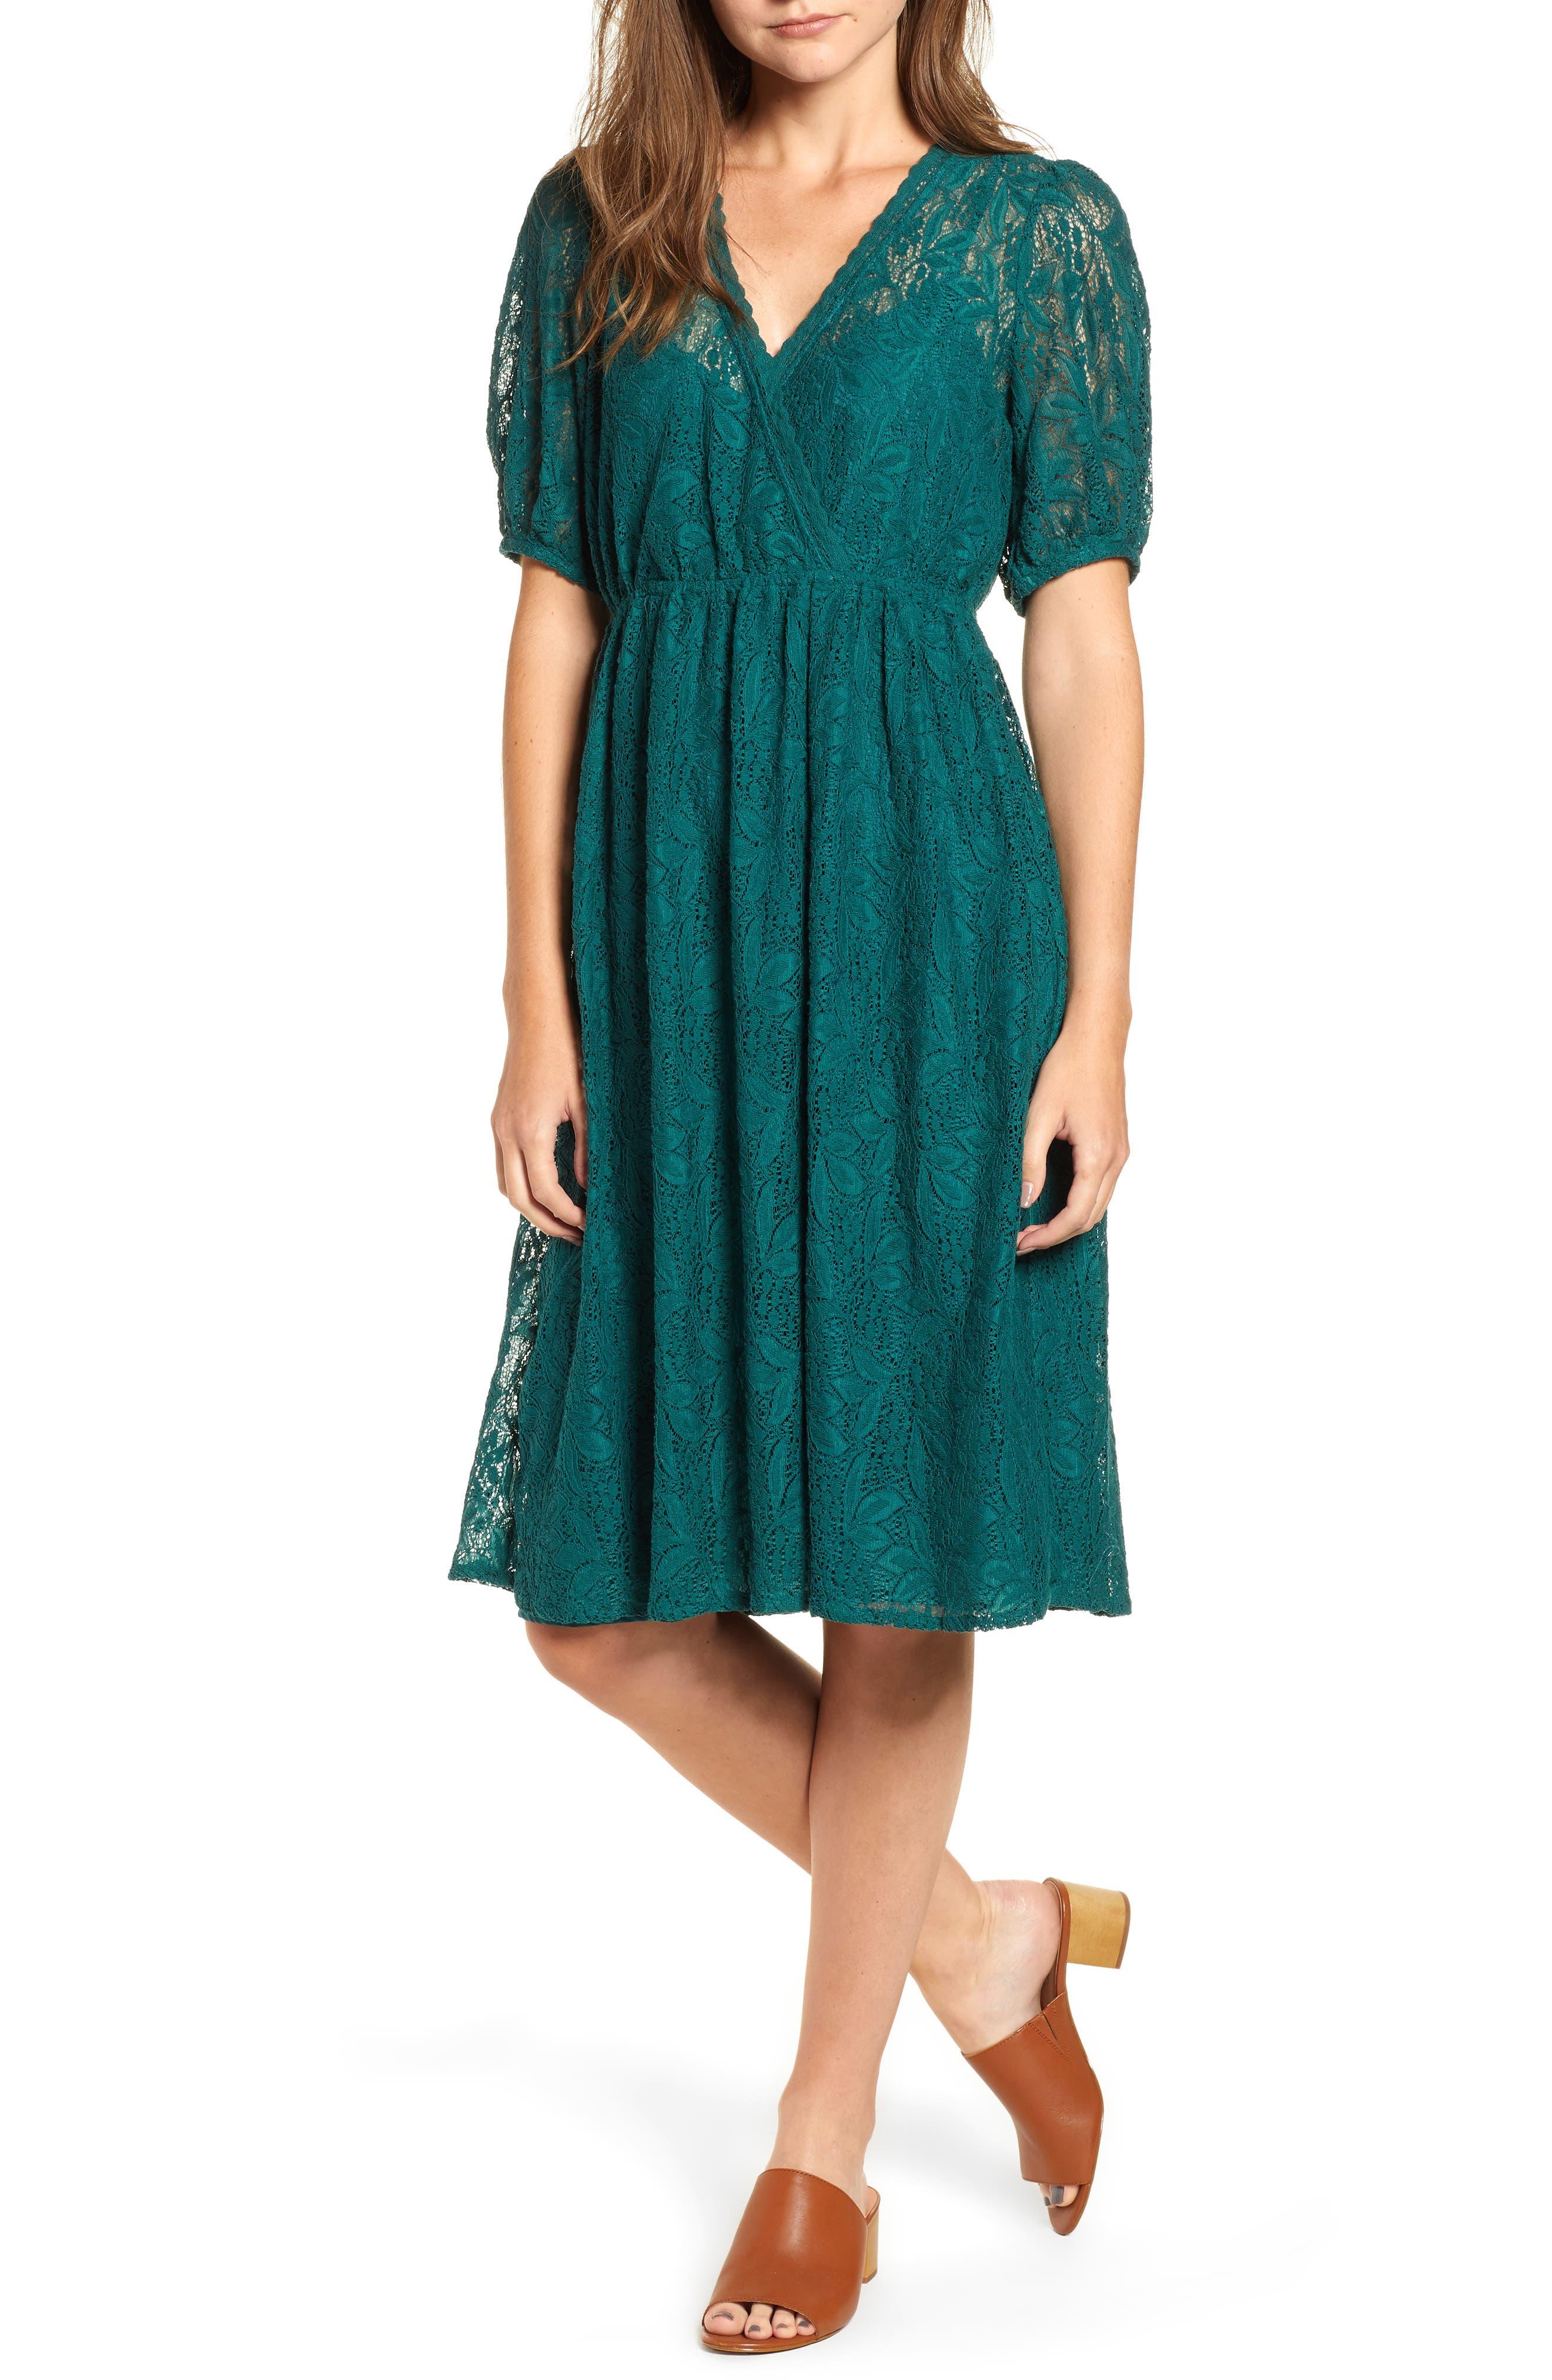 Puff Sleeve Lace Dress,                             Main thumbnail 1, color,                             301